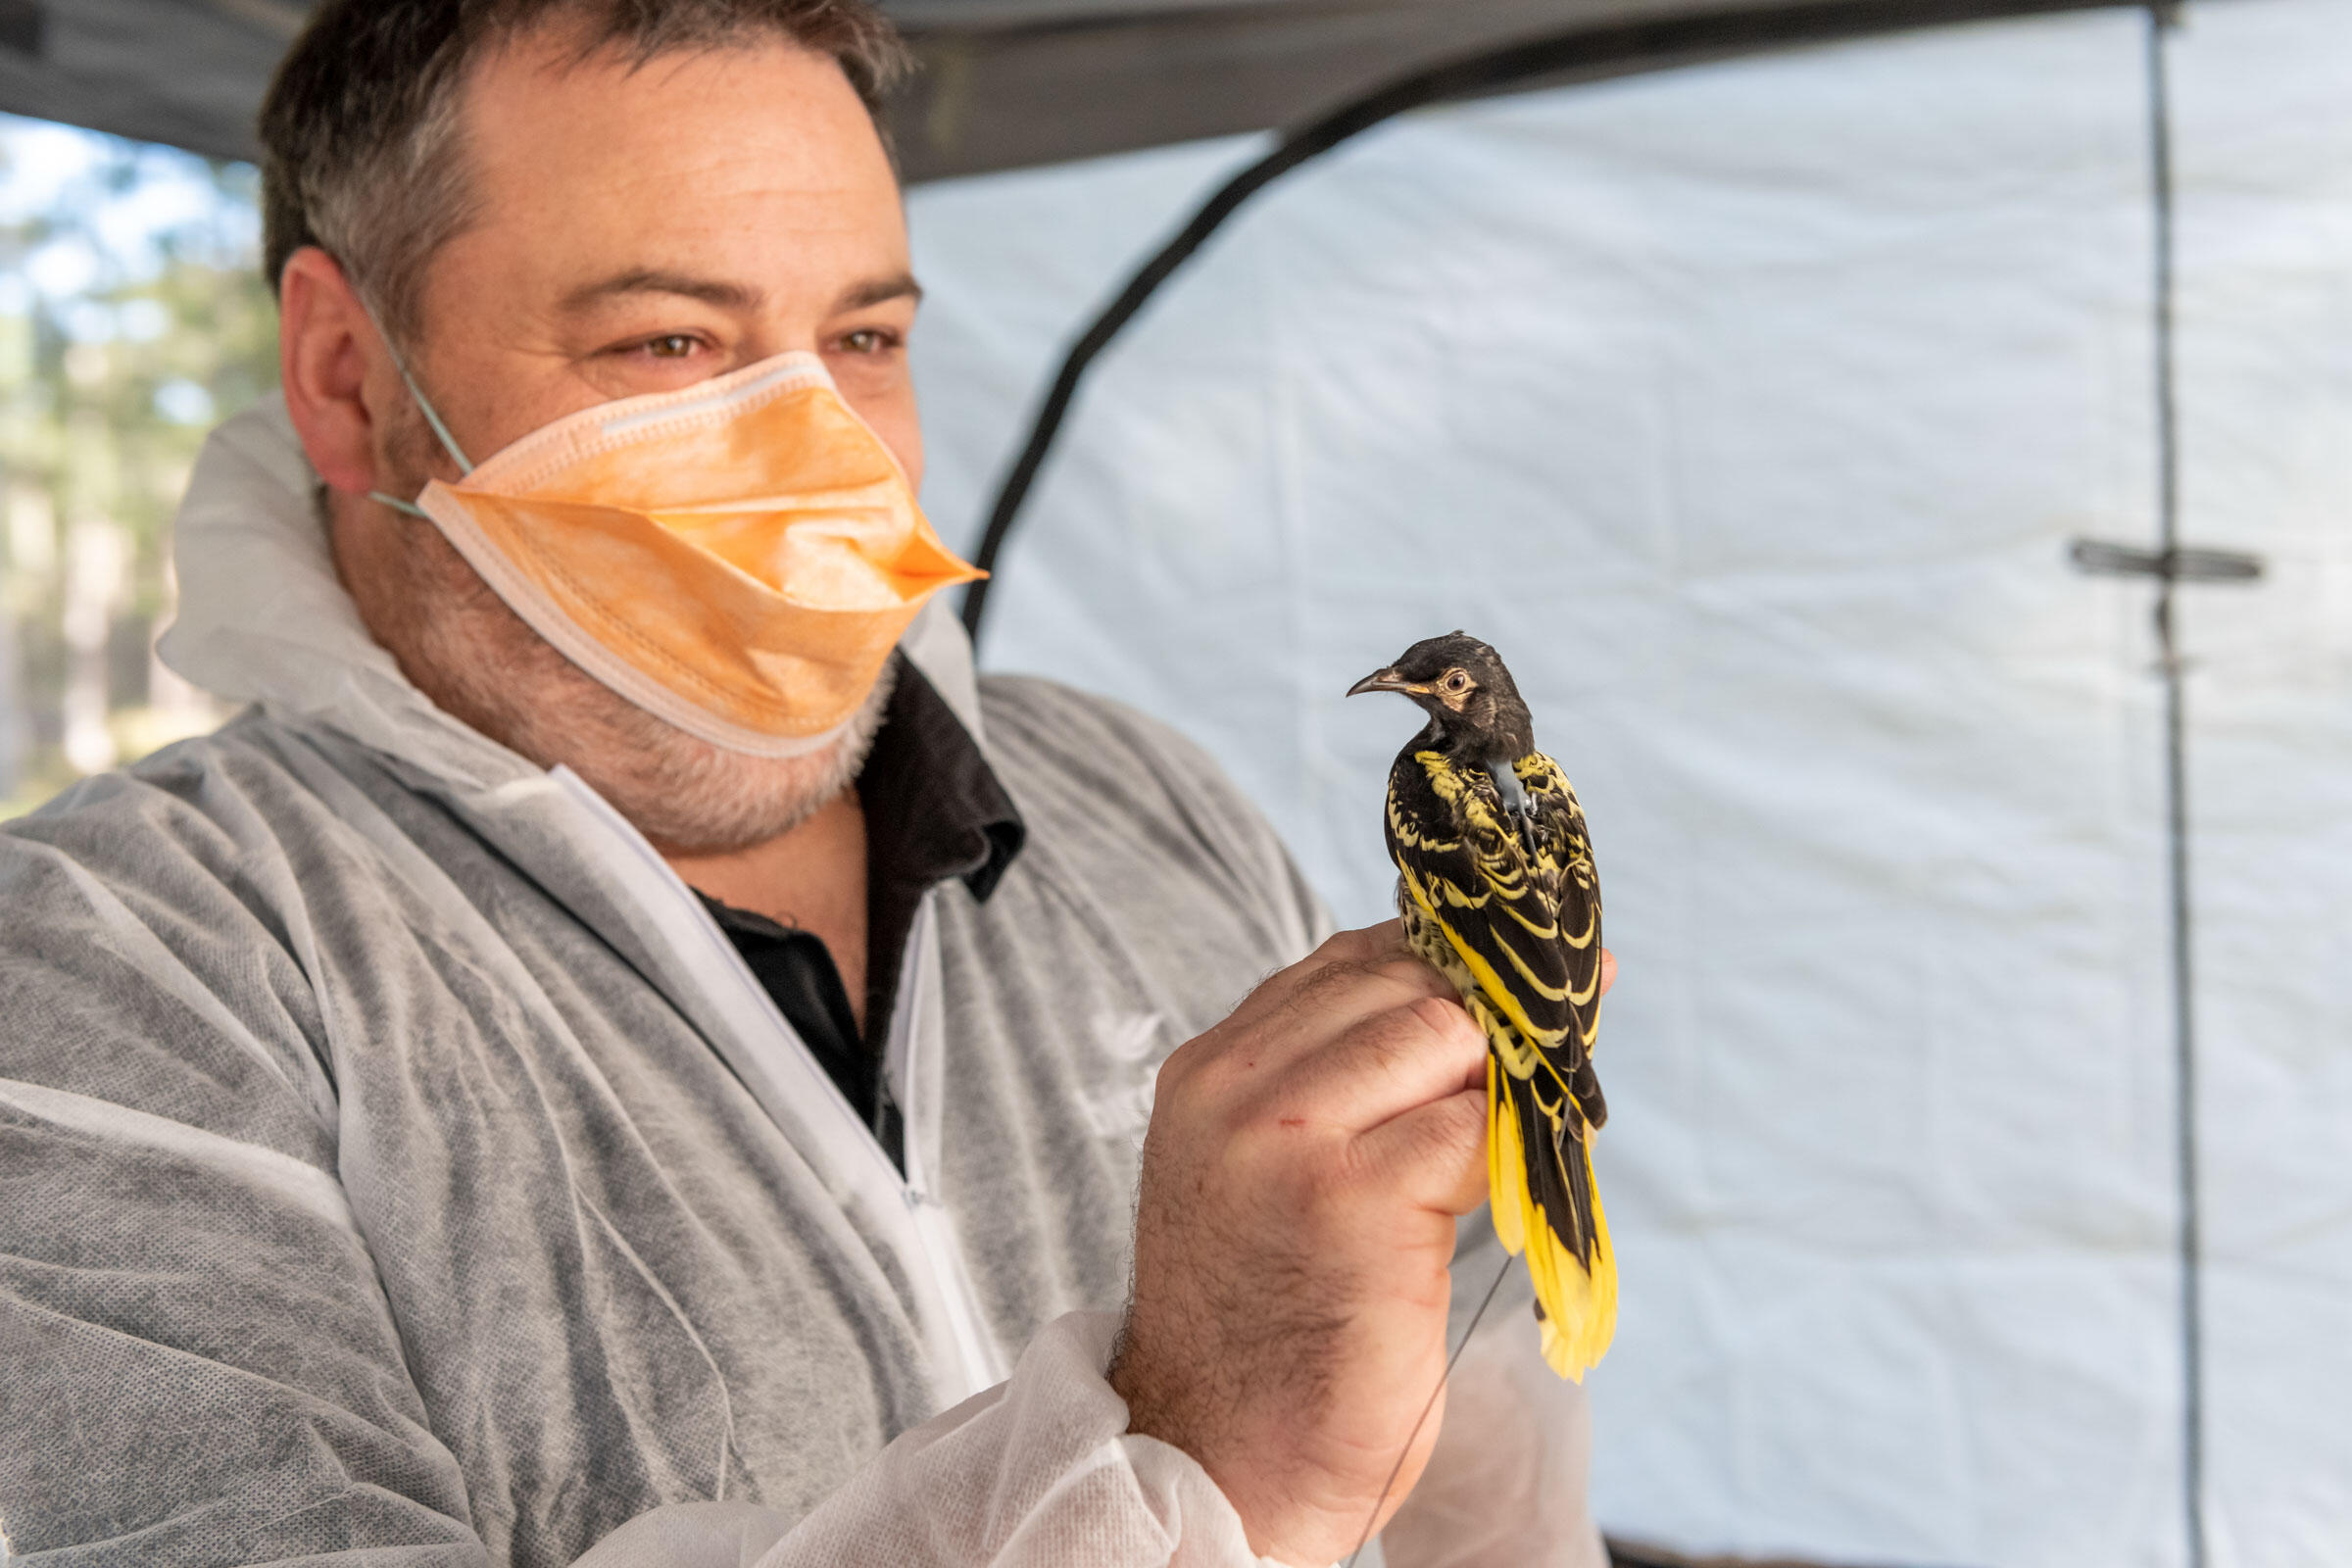 Dean Ingwersen, NSW Woodland Bird Program Manager from BirdLife Australia, holds a captive bred Regent Honeyeater. Doug Gimesy